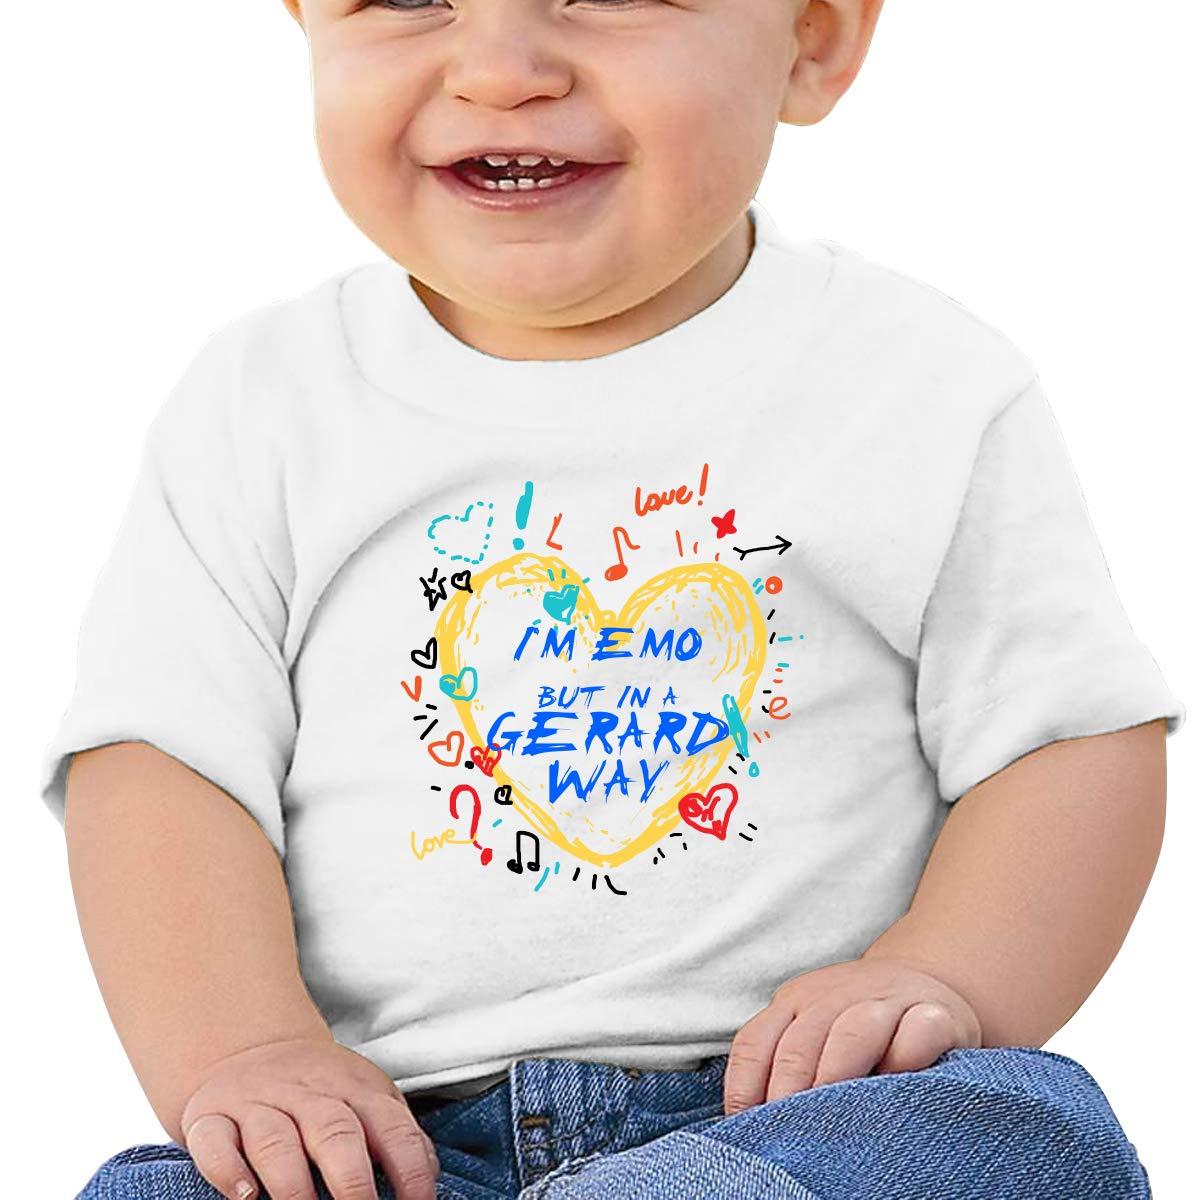 Im Emo But in A Gerard Way Short-Sleeve T-Shirt Baby Girls